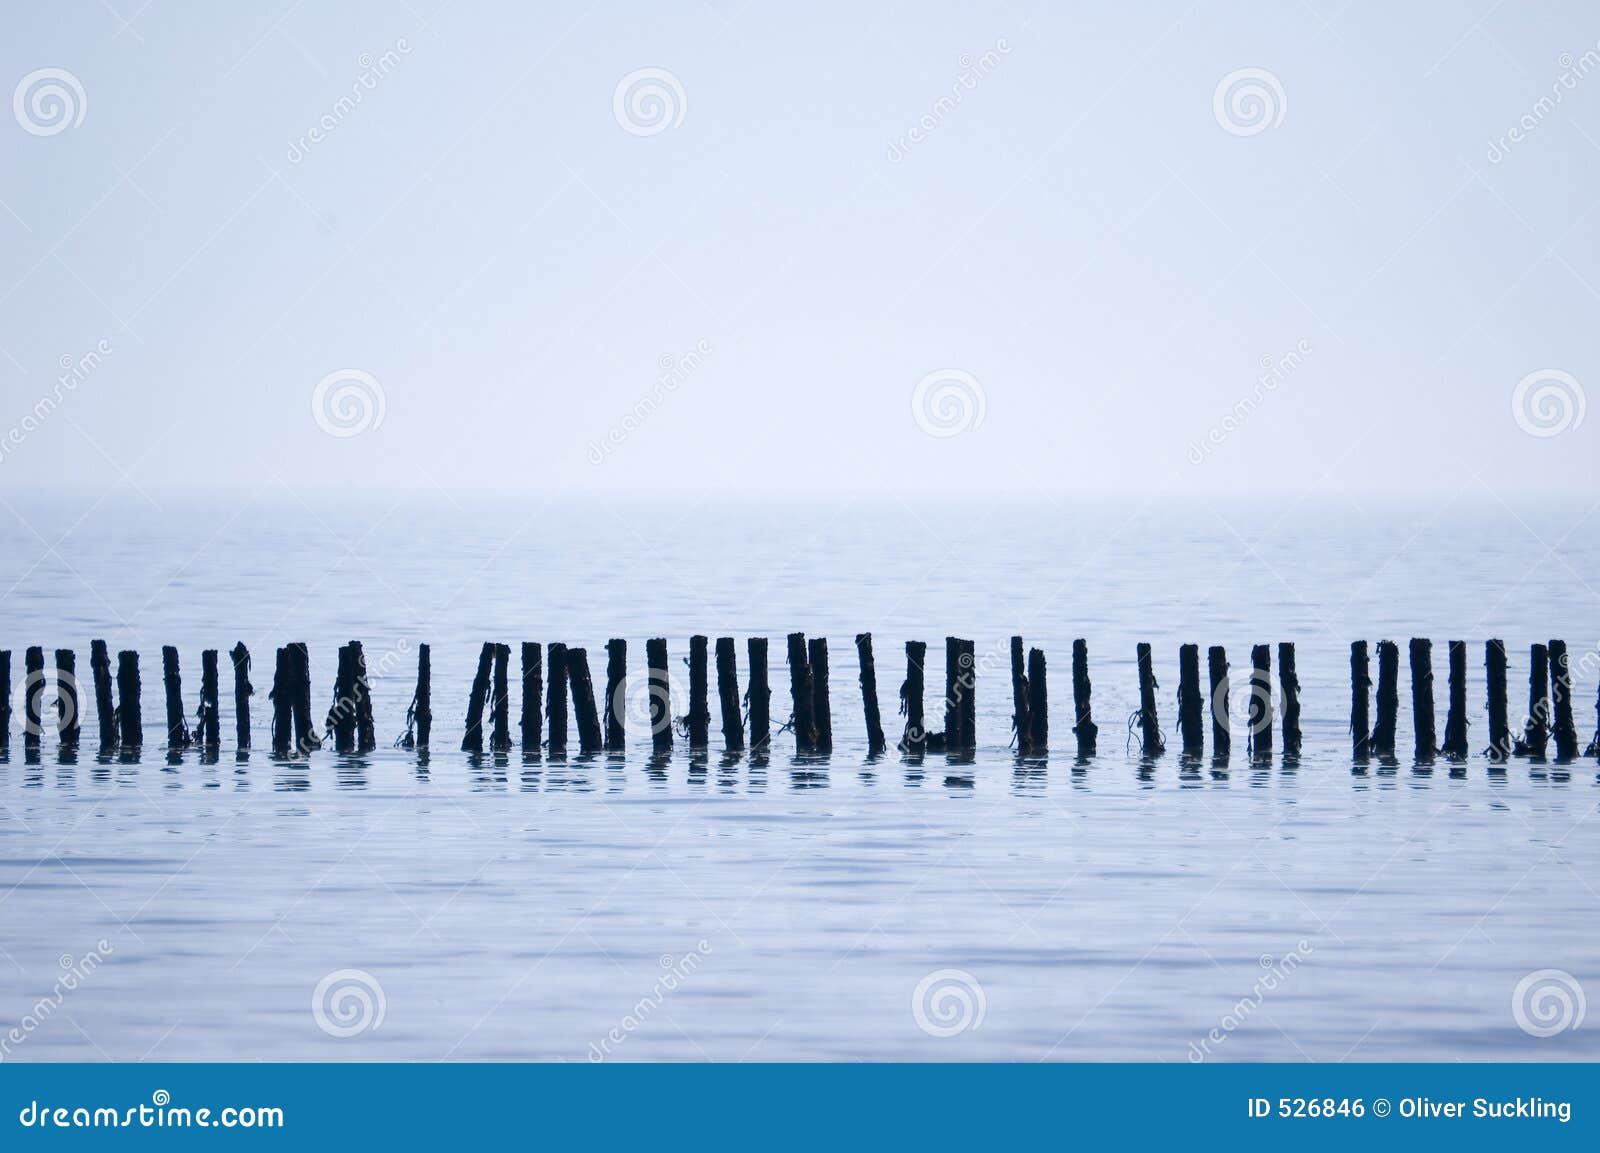 Mar tranquilo